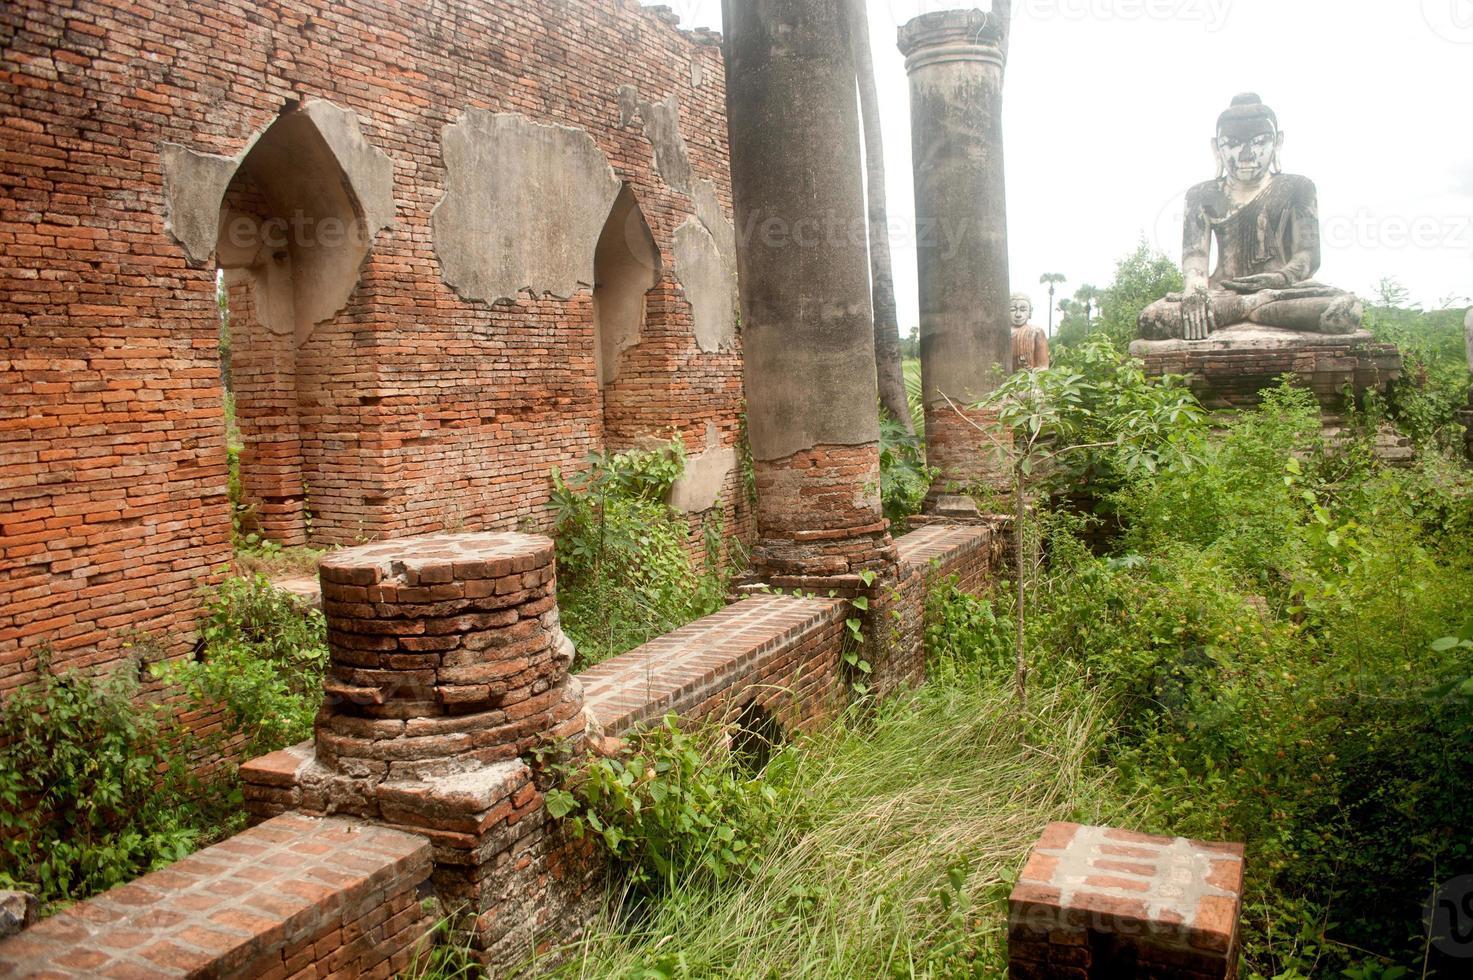 yadana hsemee pagodecomplex in myanmar. foto